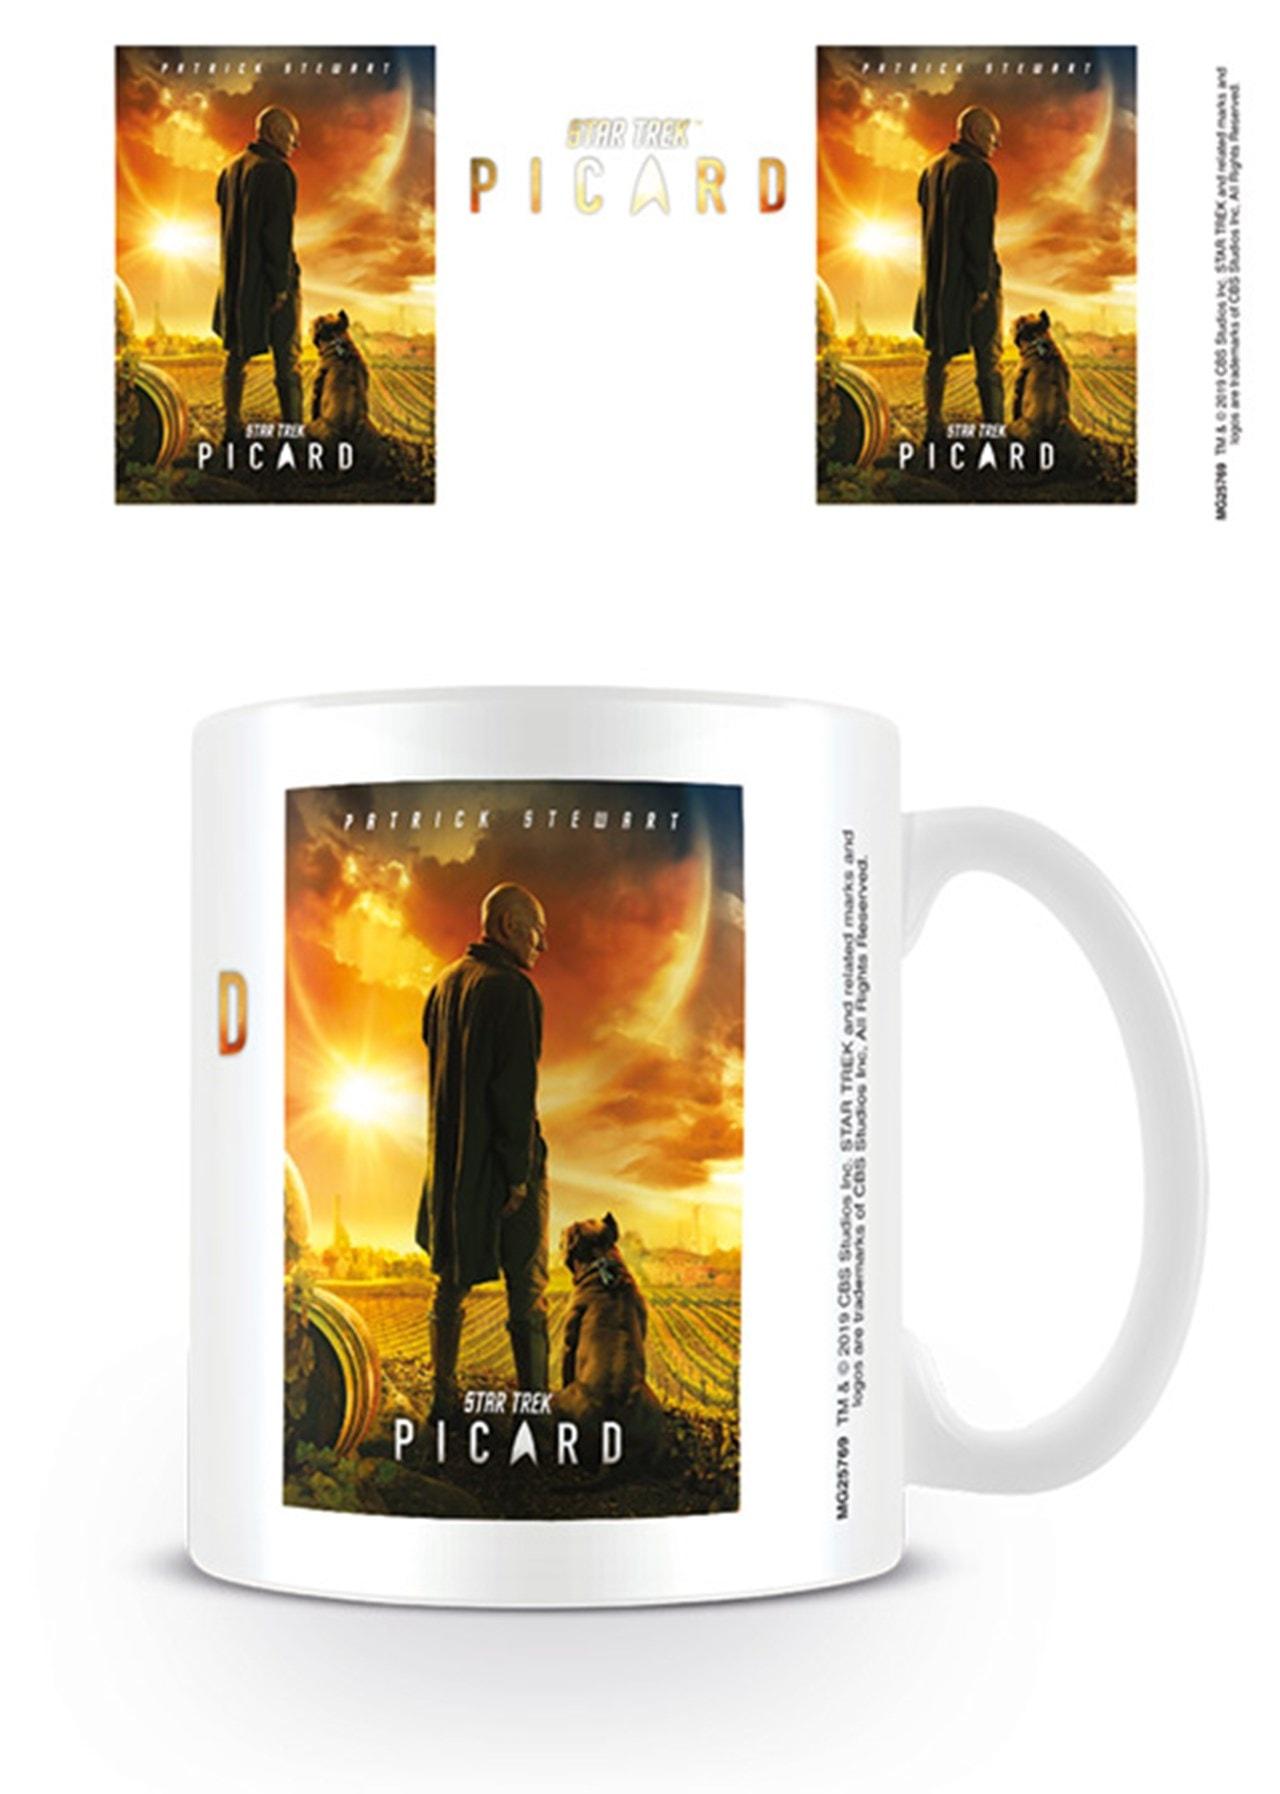 Mug: Star Trek: Picard: Picard Number One - 1